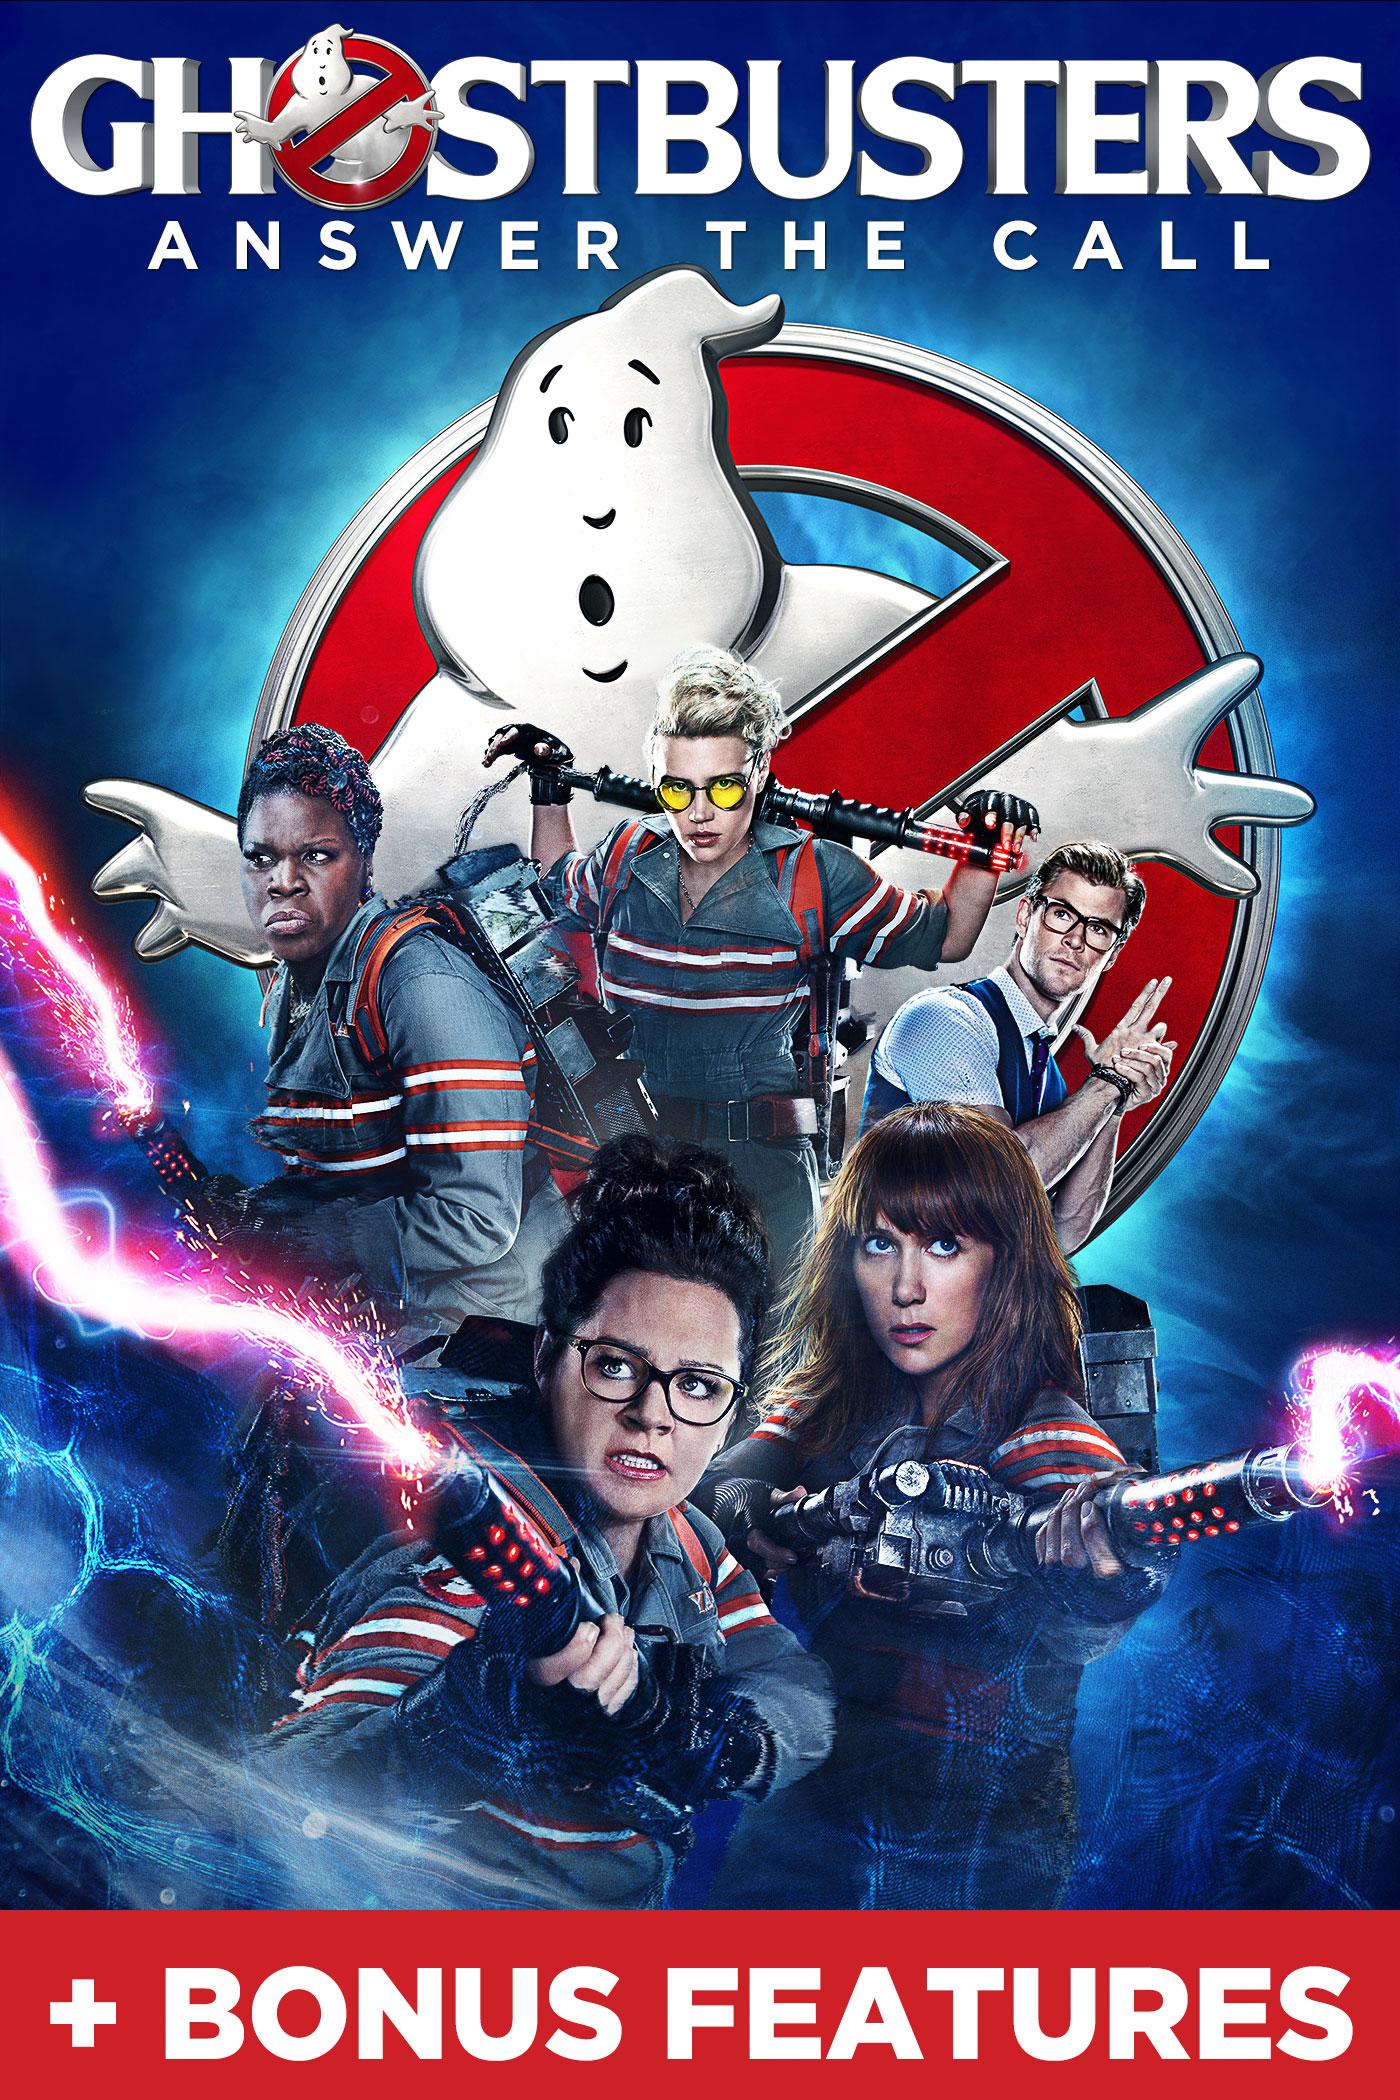 Ghostbusters (2016) + Bonus